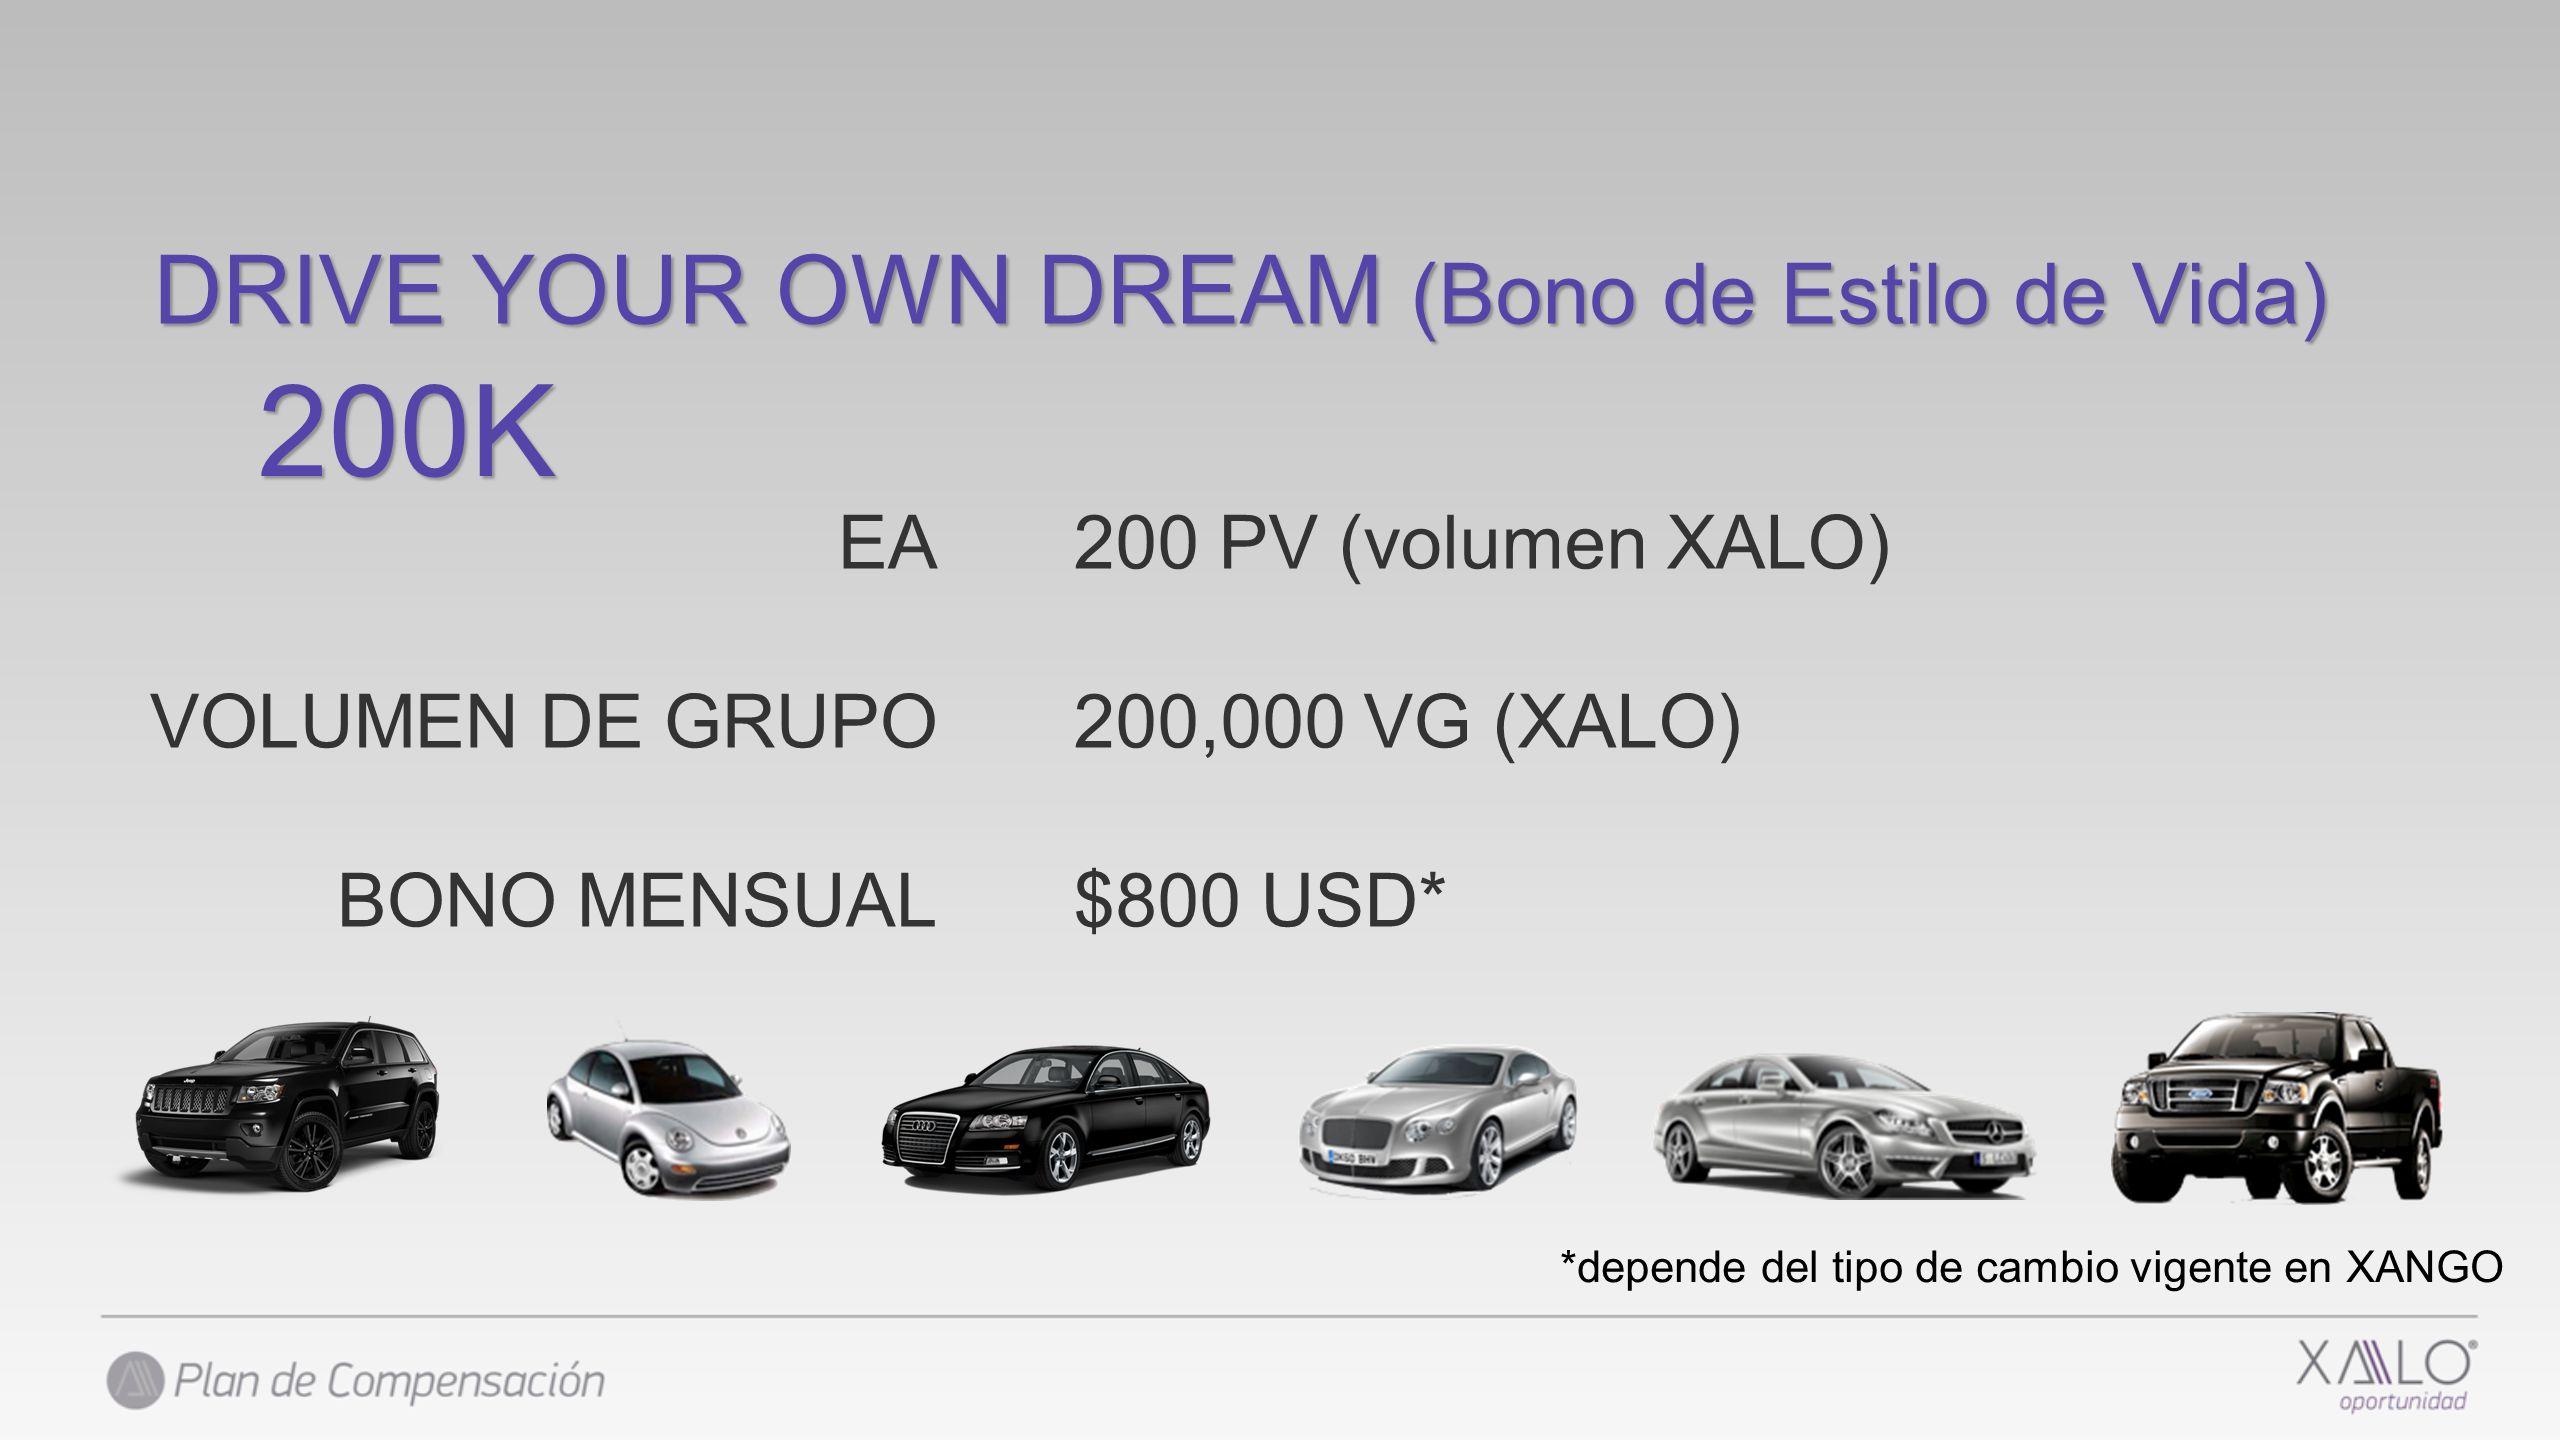 200K 200 PV (volumen XALO) 200,000 VG (XALO) $800 USD* DRIVE YOUR OWN DREAM (Bono de Estilo de Vida) EA VOLUMEN DE GRUPO BONO MENSUAL *depende del tip